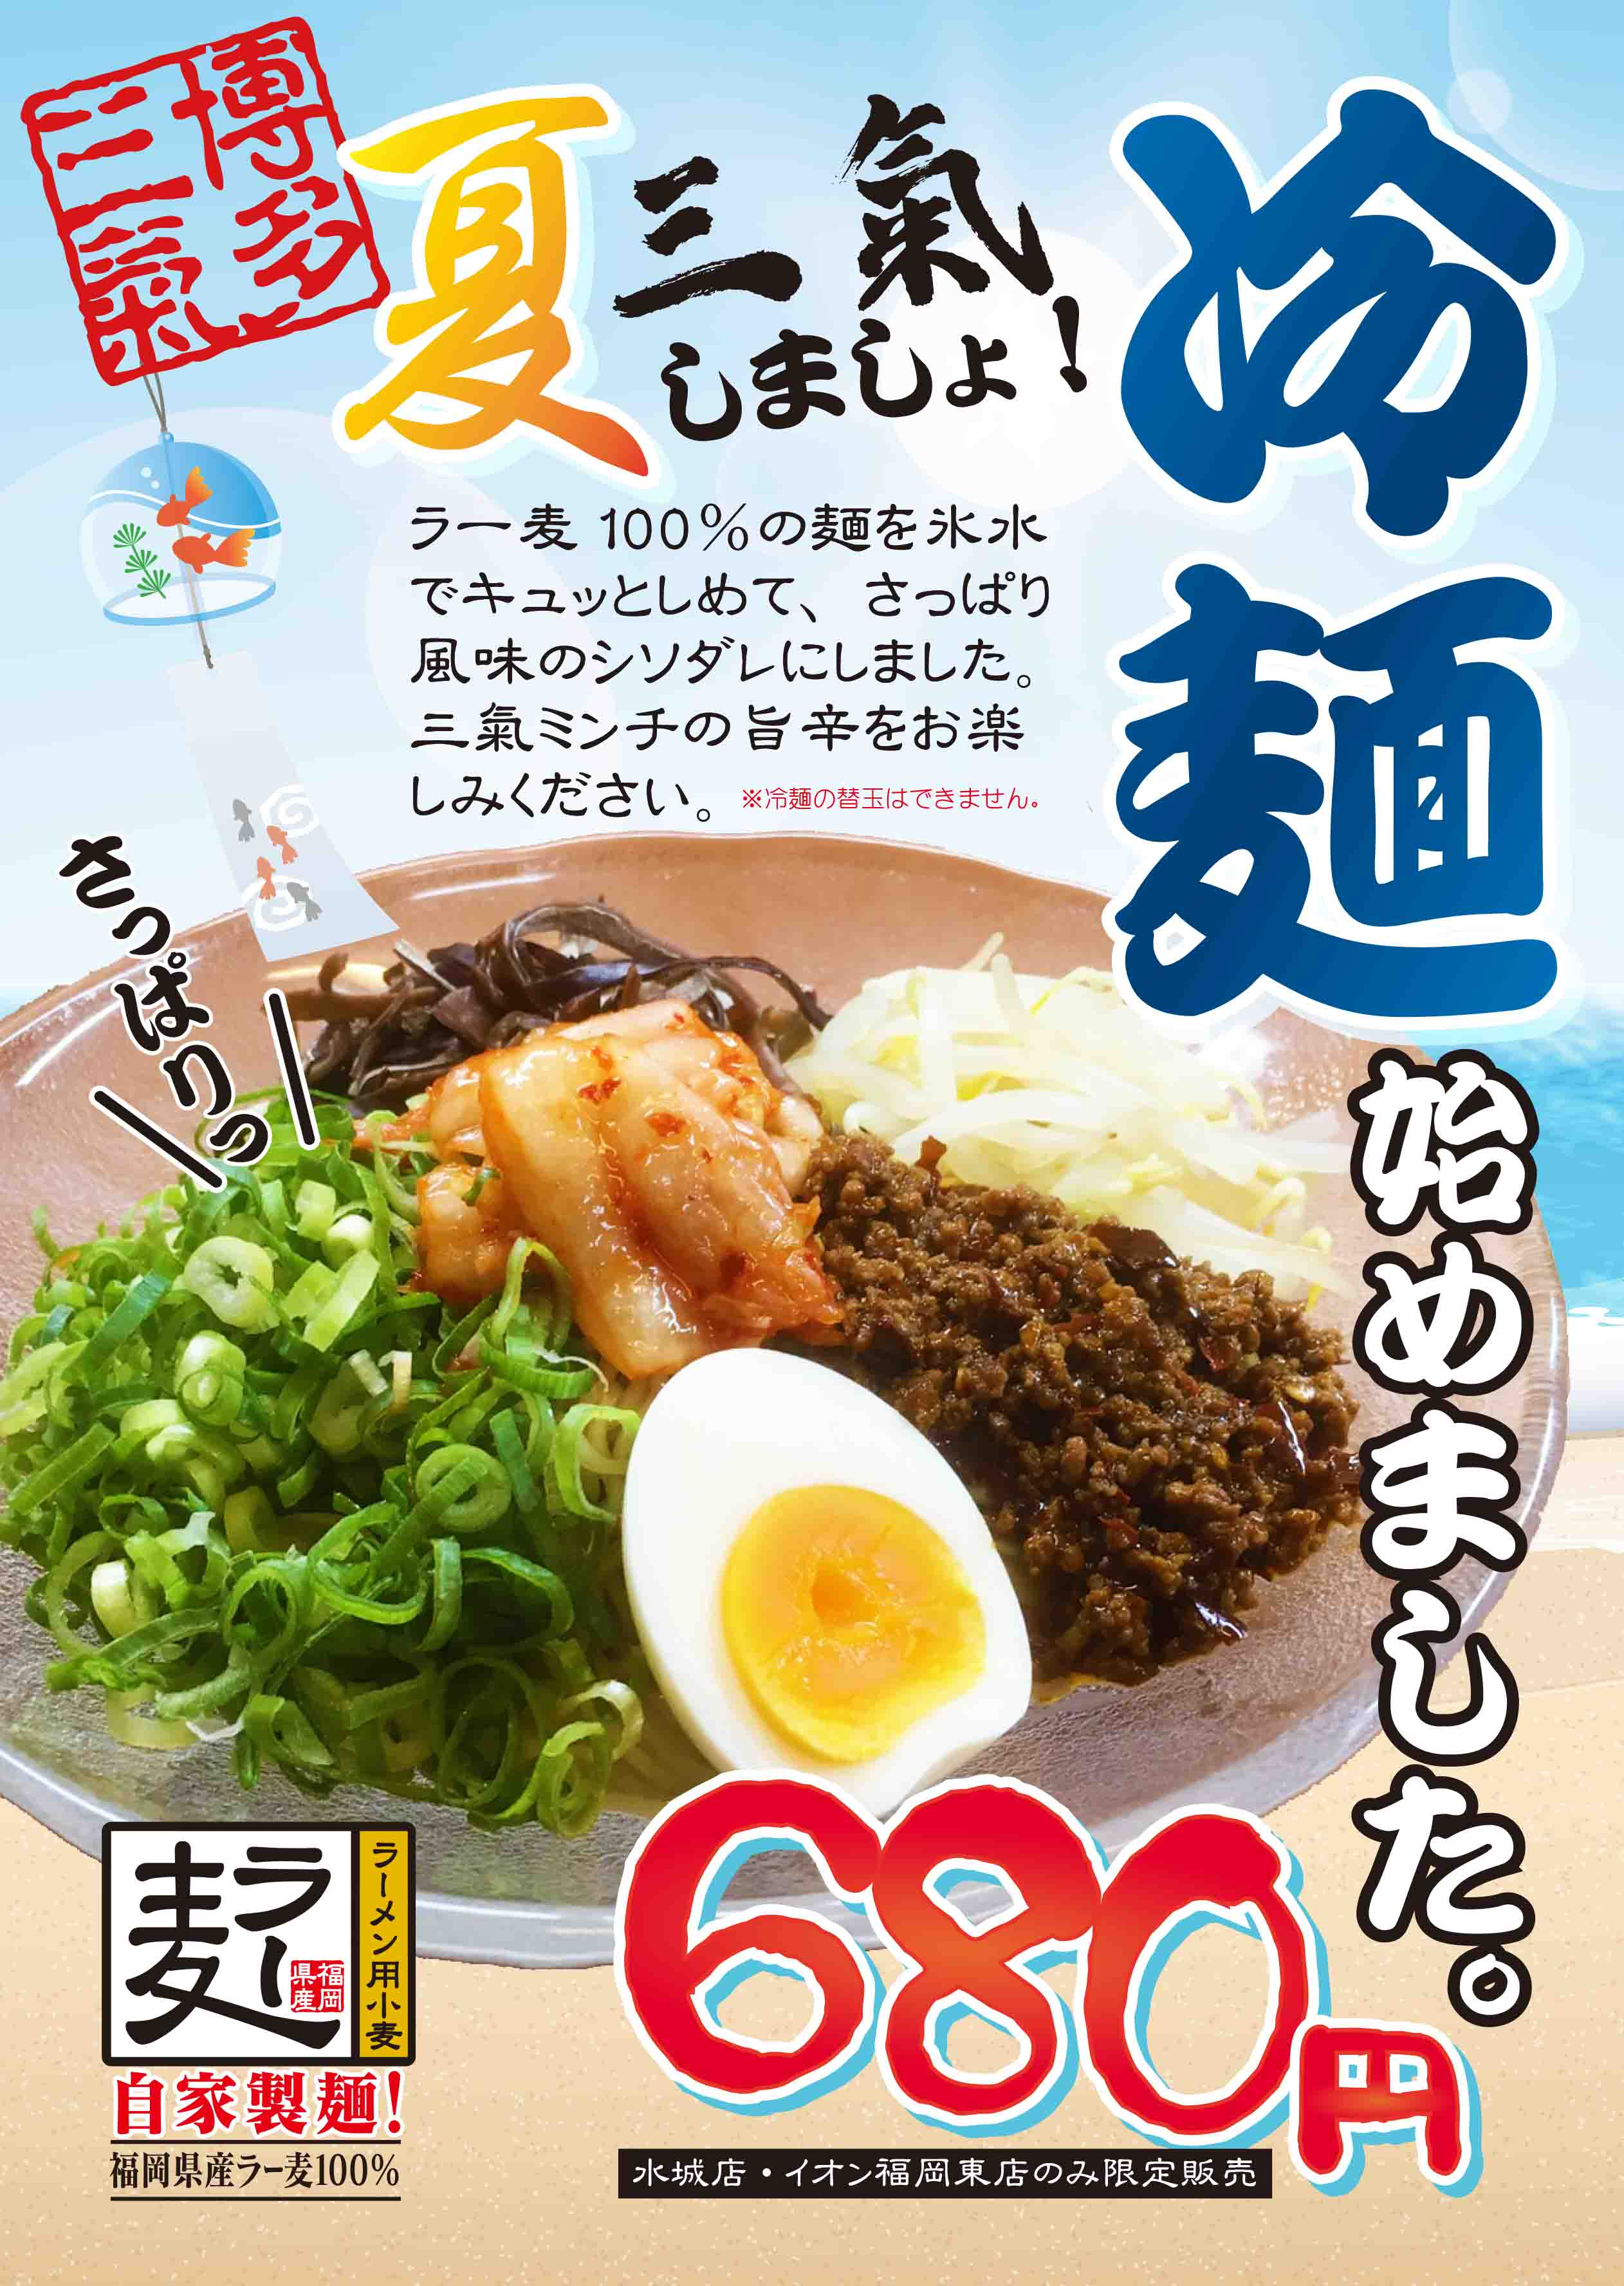 【POP】三氣_冷麺new_fin